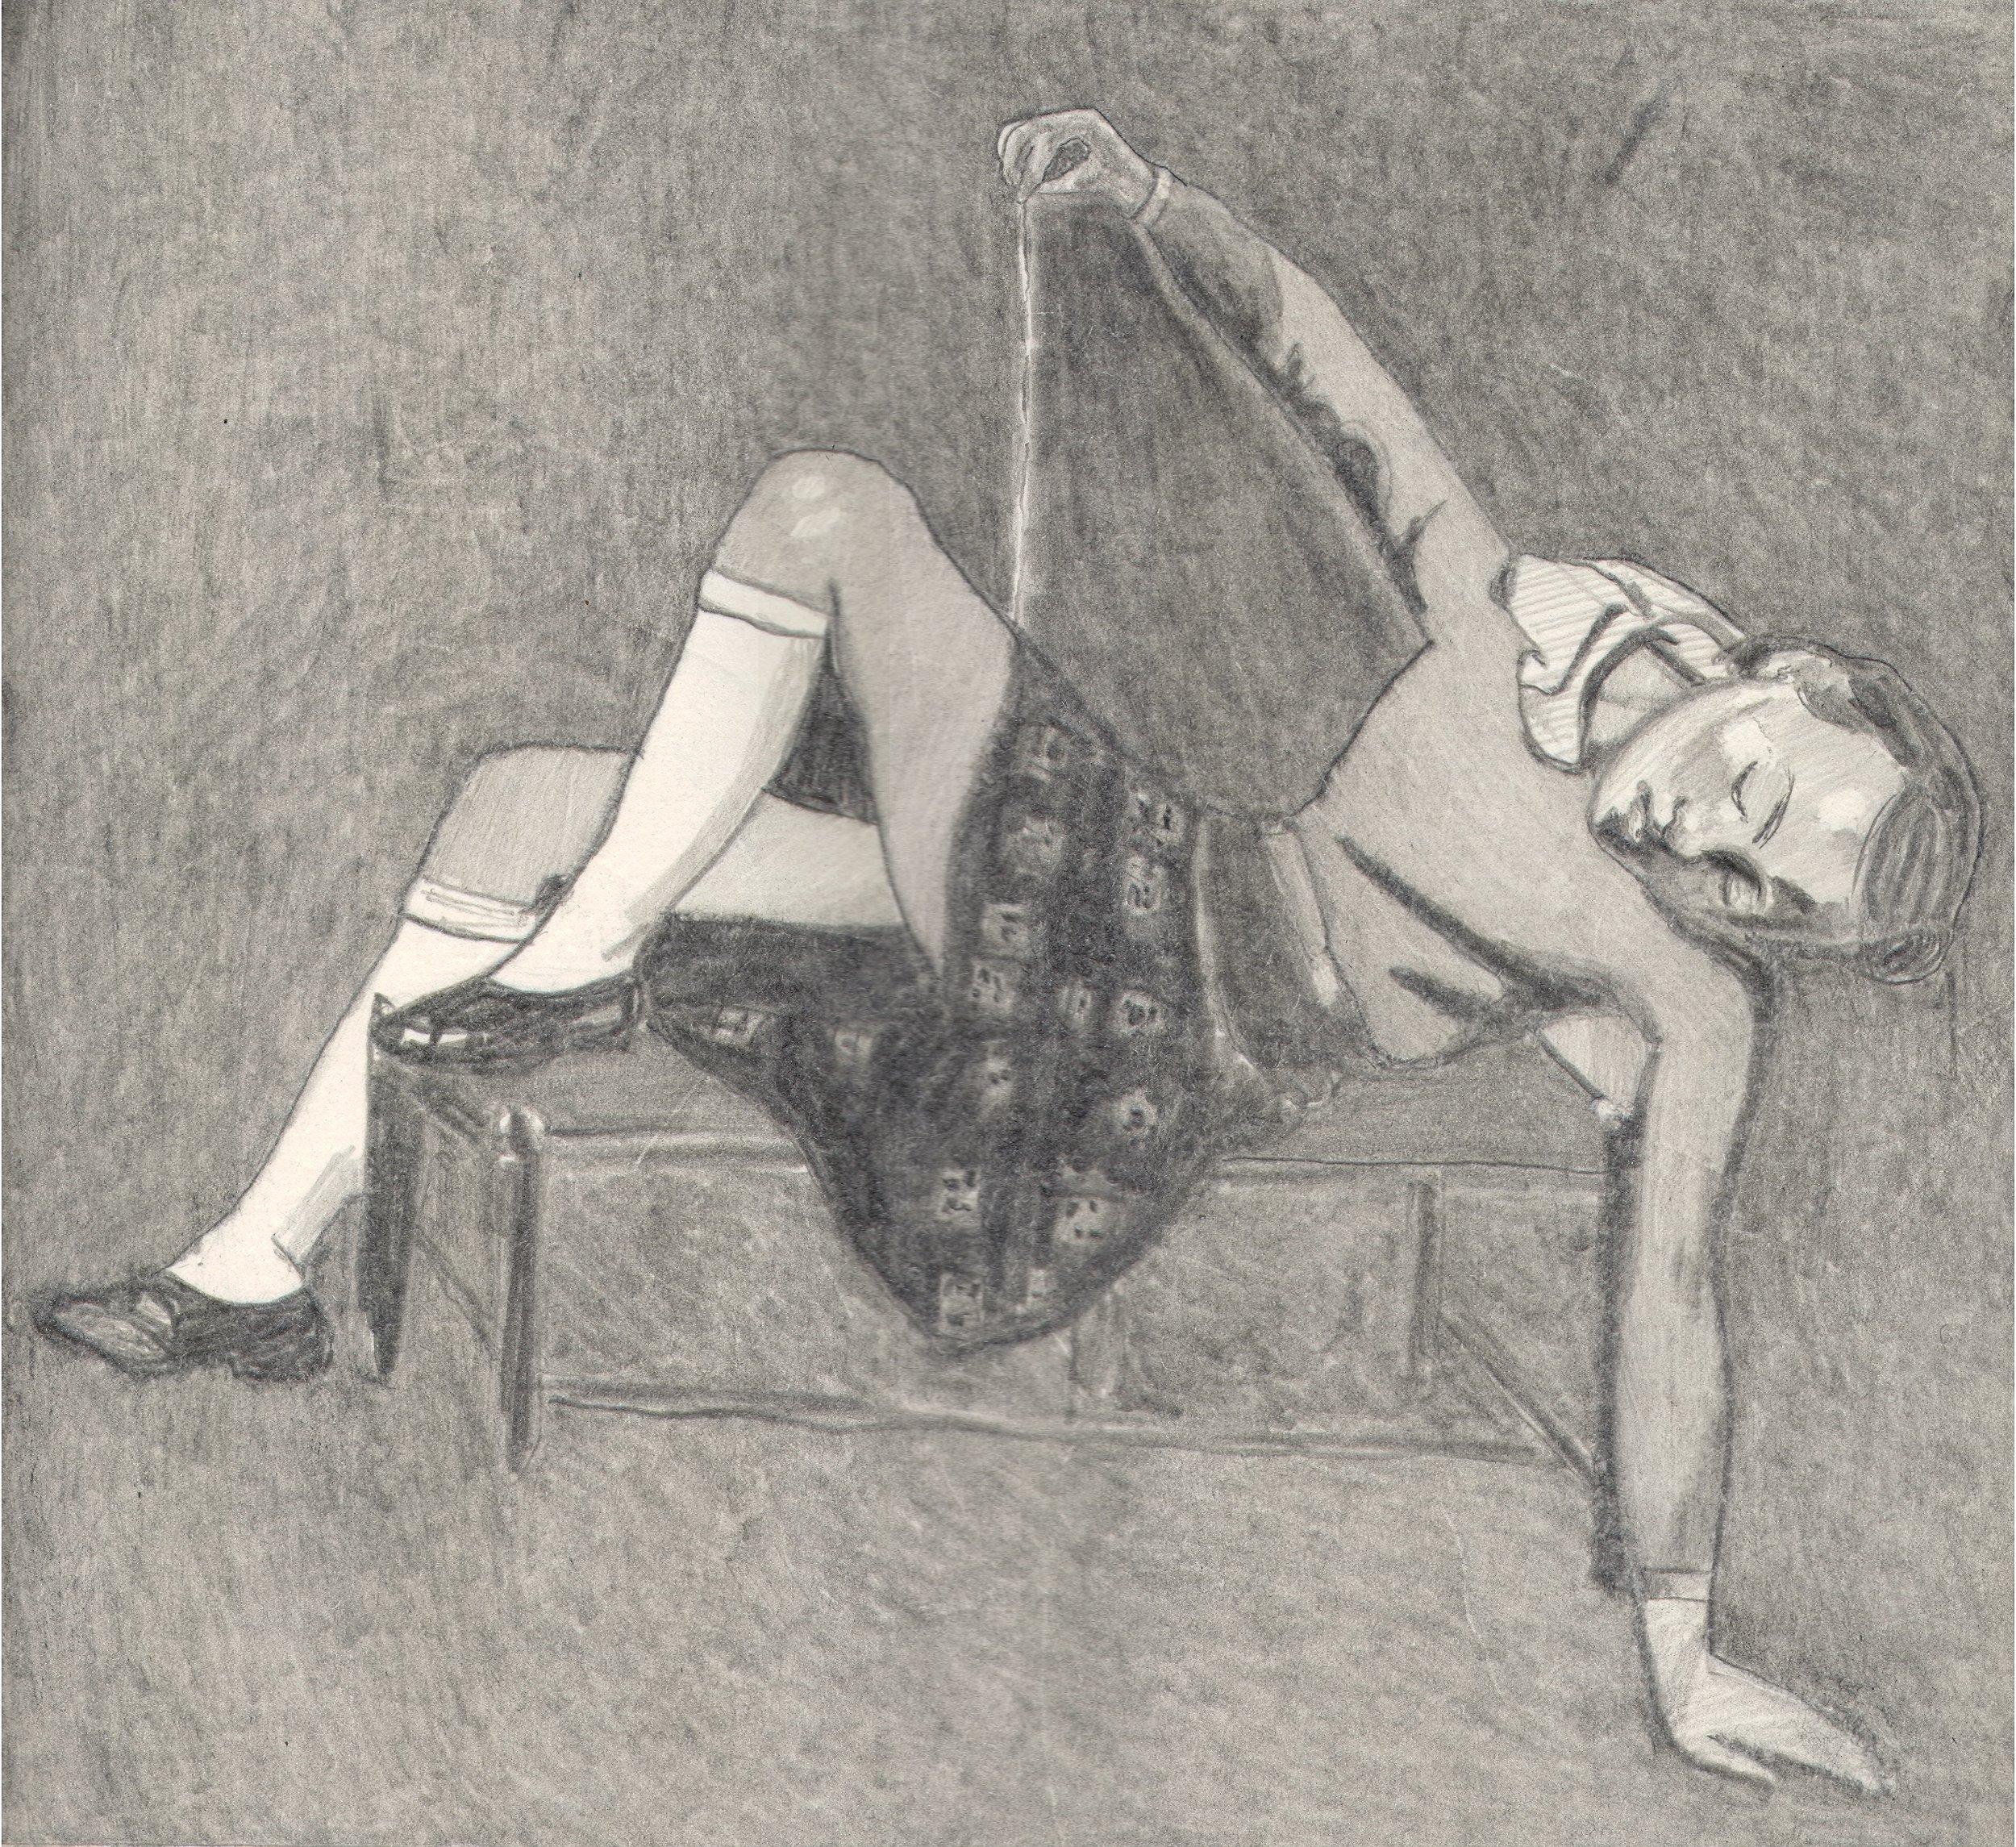 O.T. ( Serie Balthus 8 ), 2018  Bleistift auf Papier, 26x35.5cm